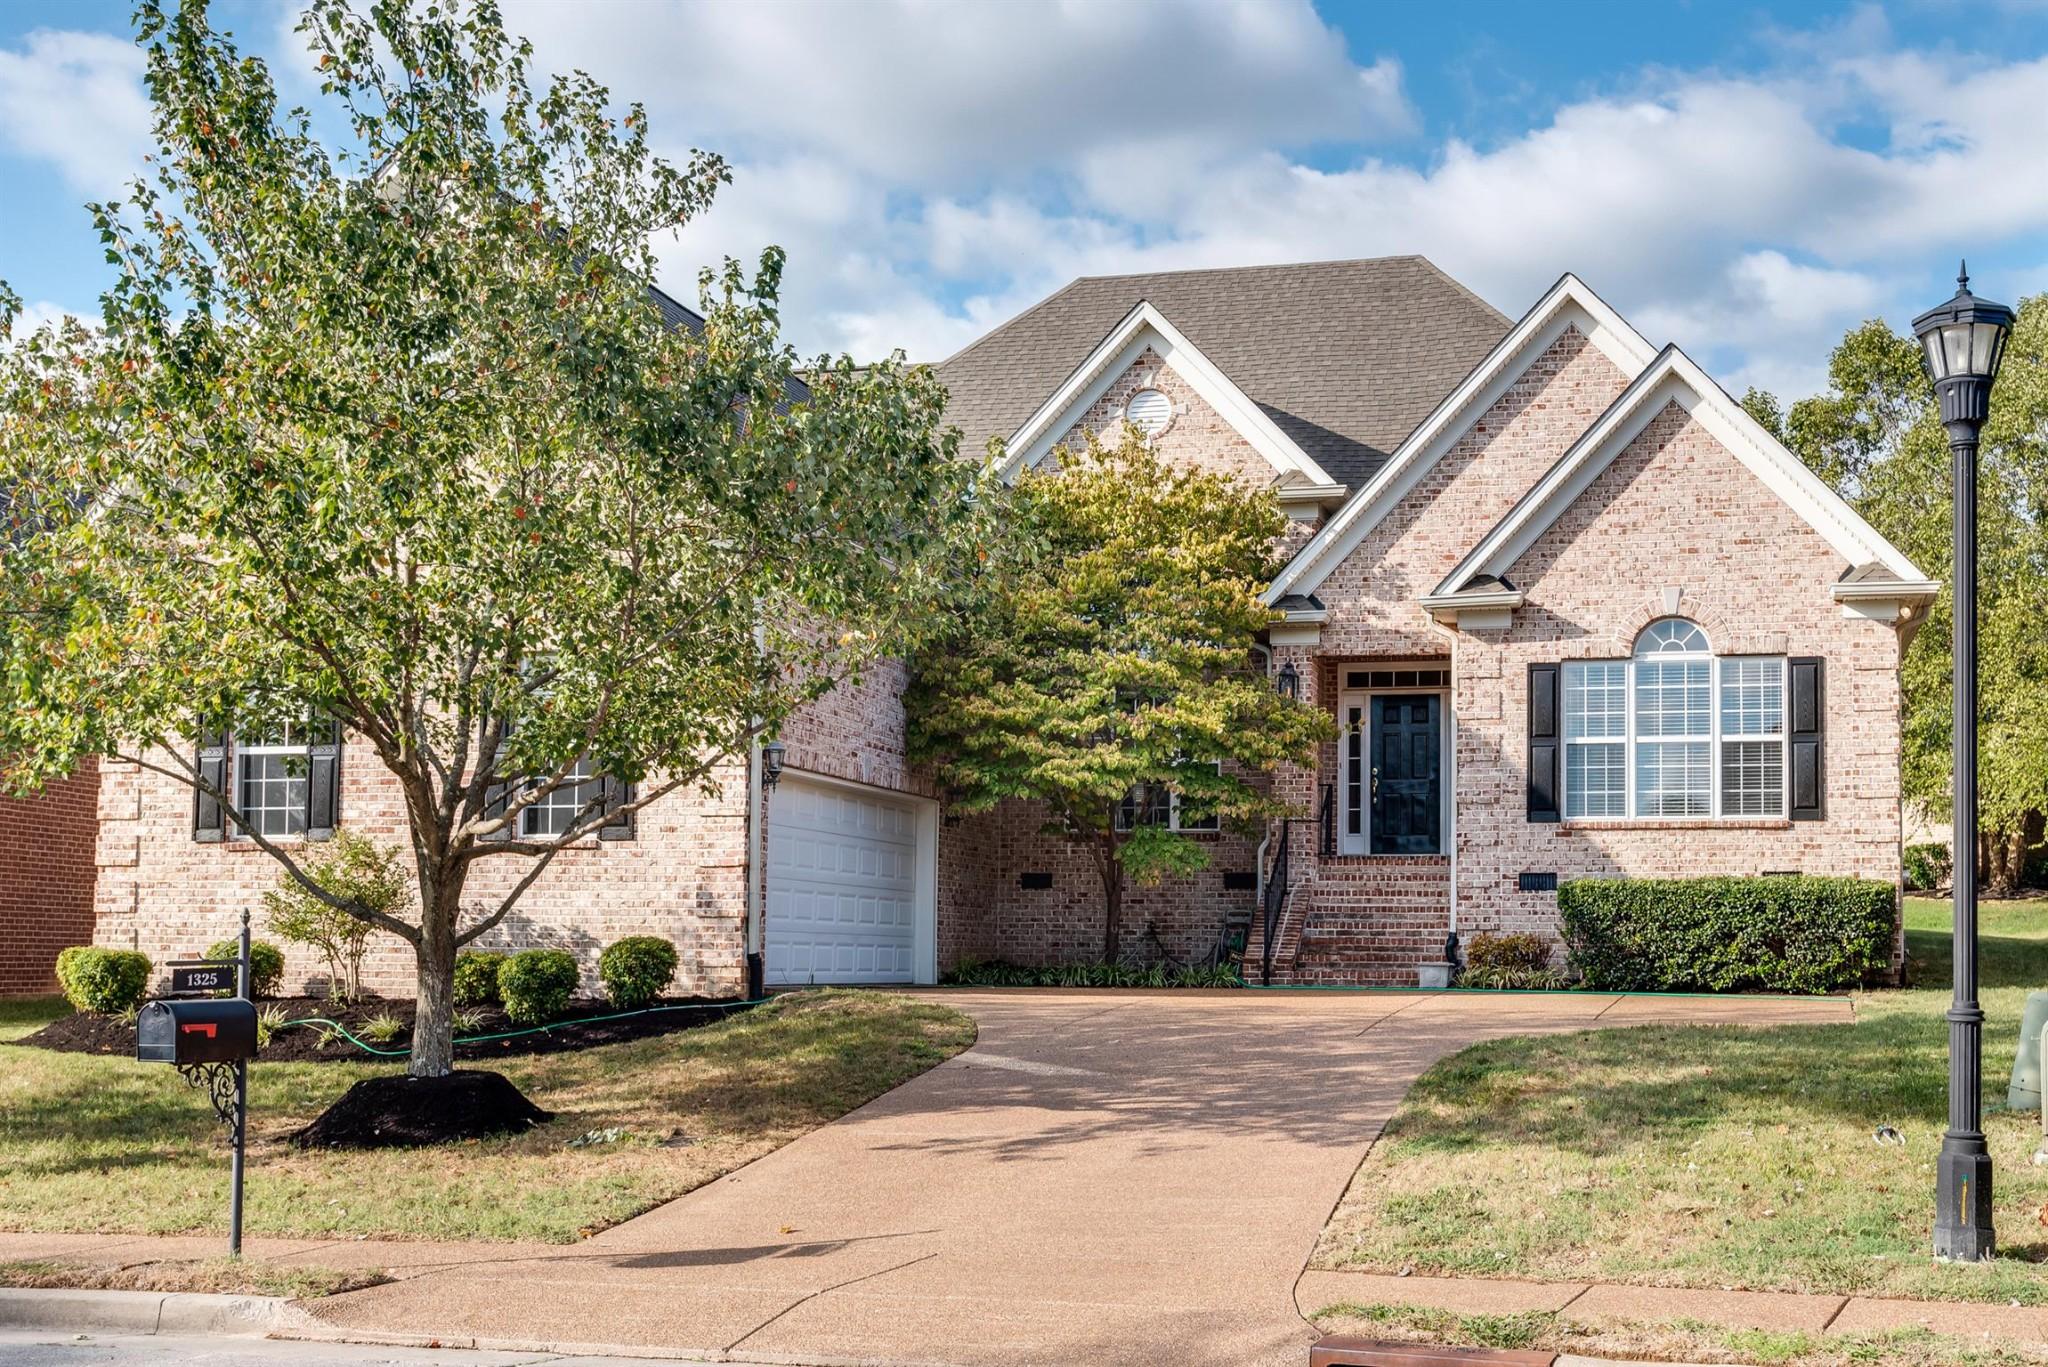 1325 Wexford Downs Ln, Nashville, TN 37211 - Nashville, TN real estate listing